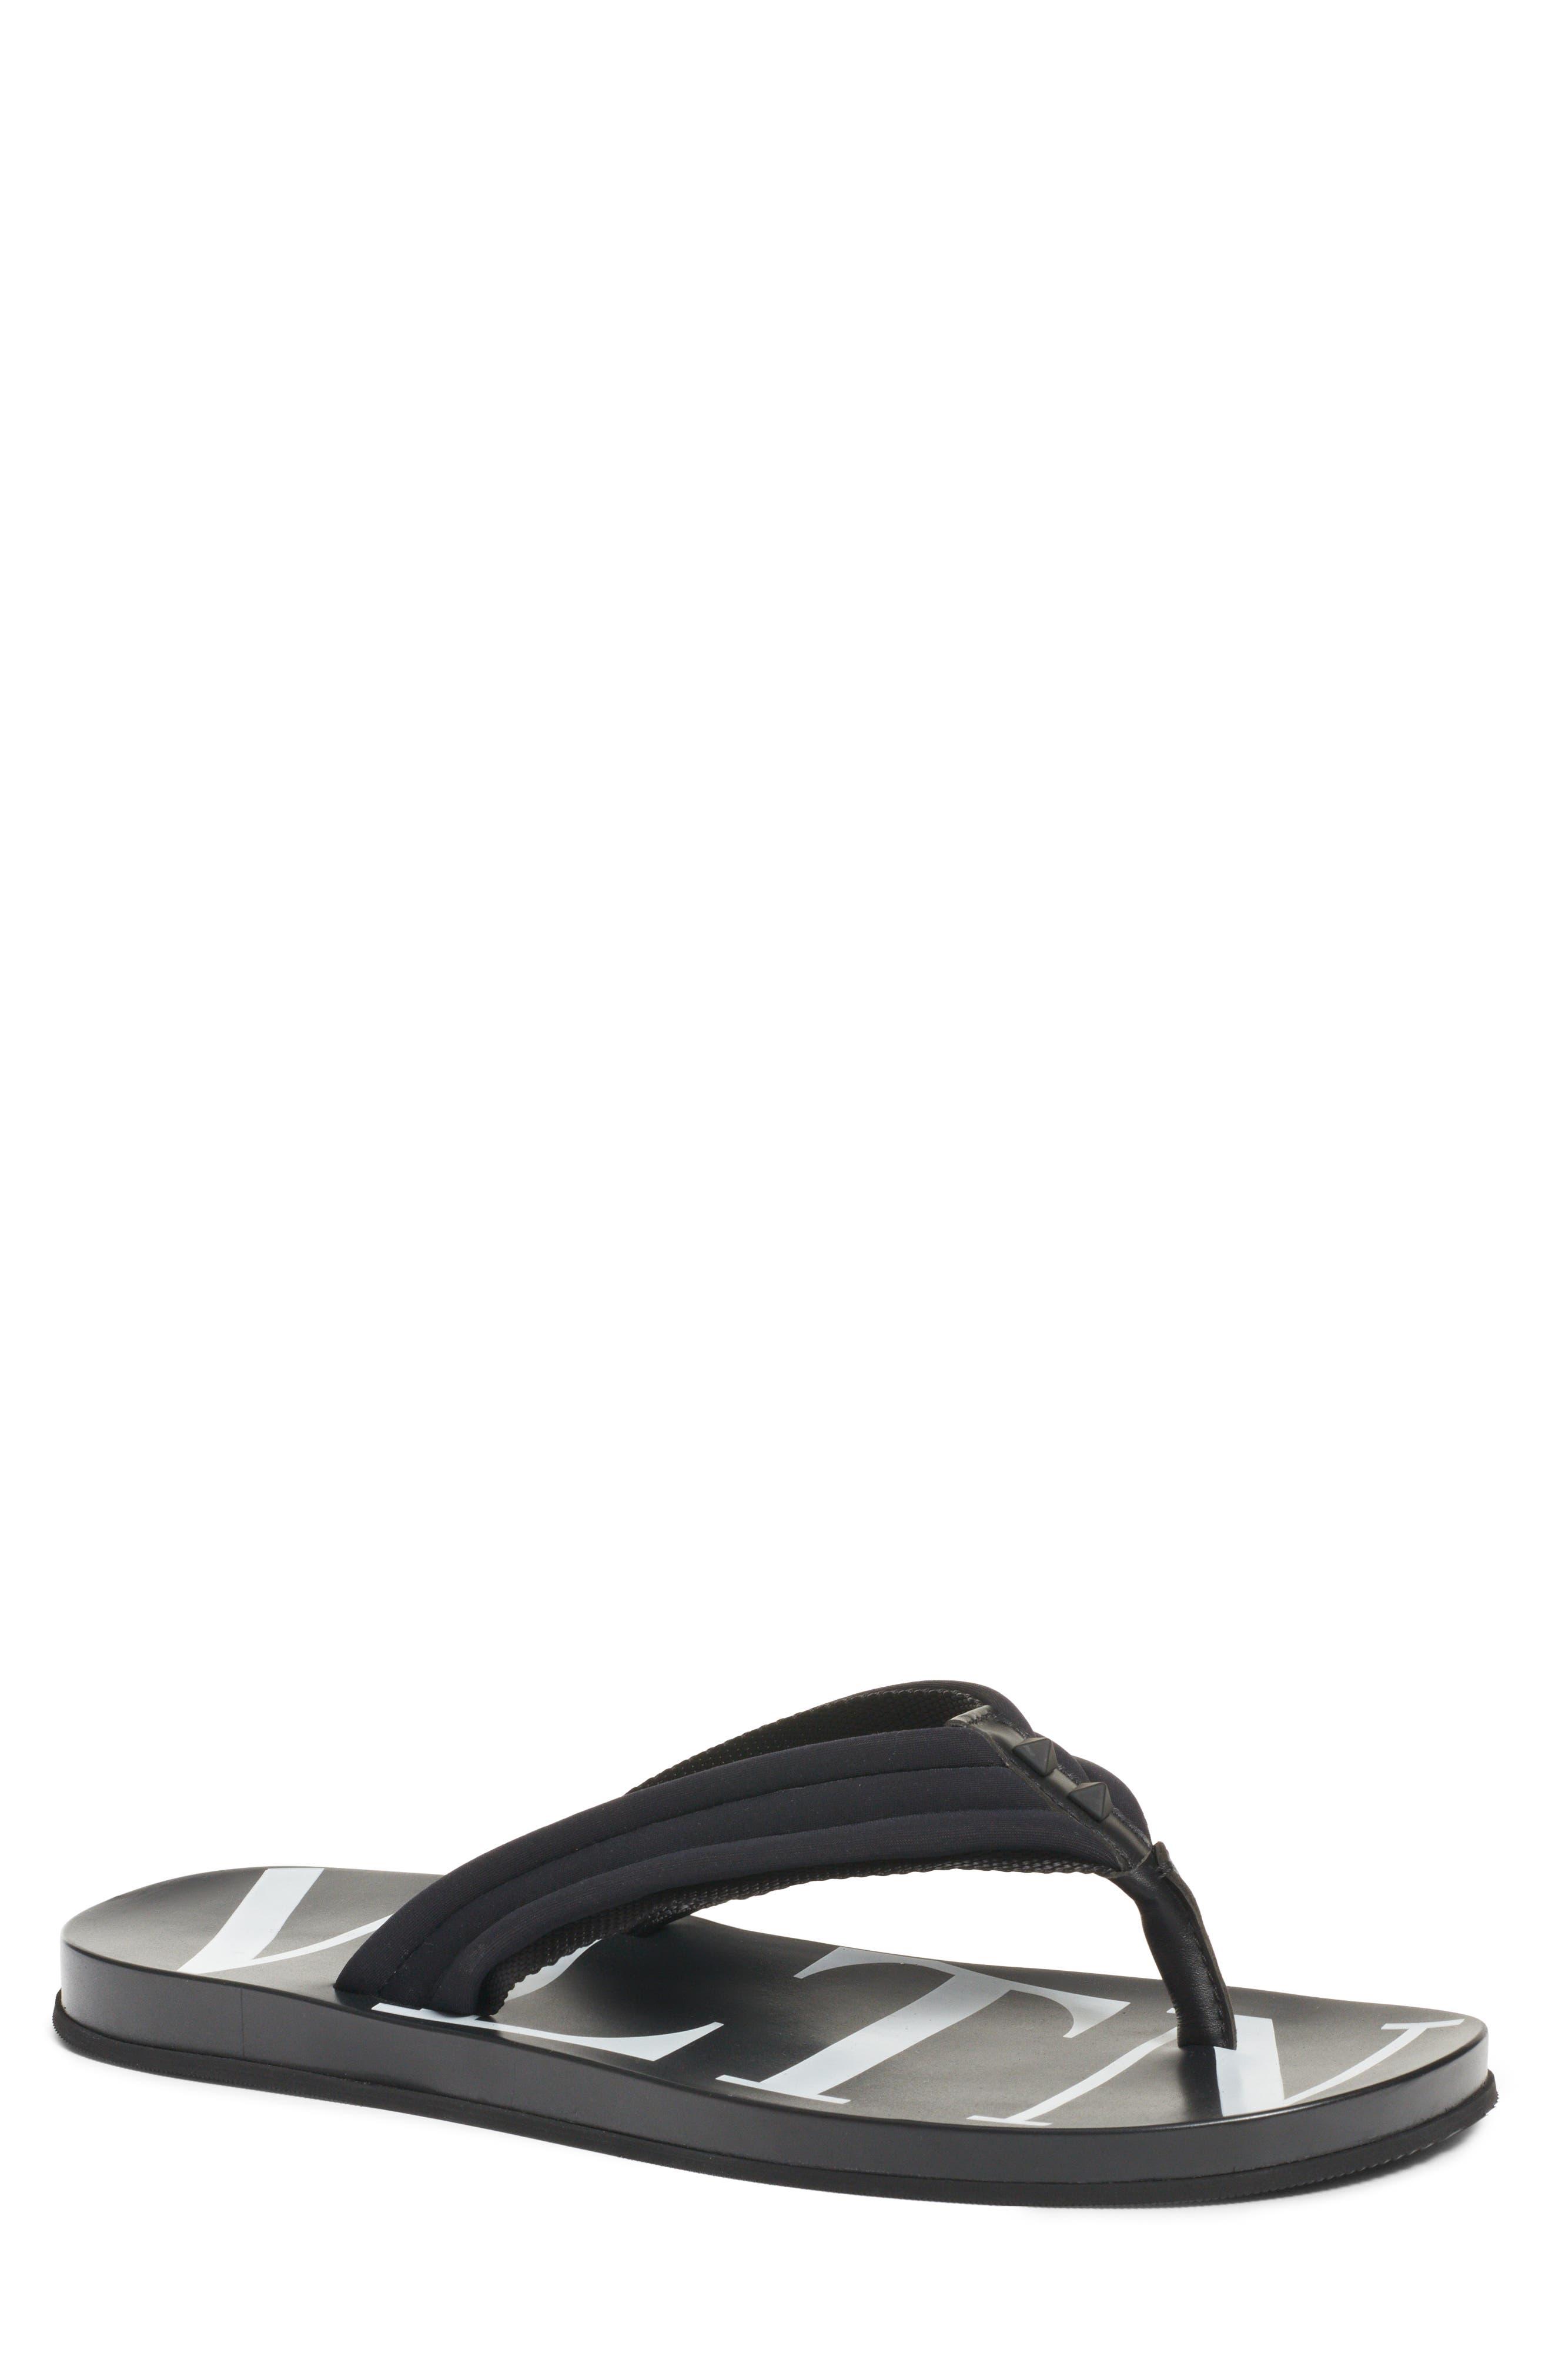 Sandal, Main, color, BLACK/ WHITE